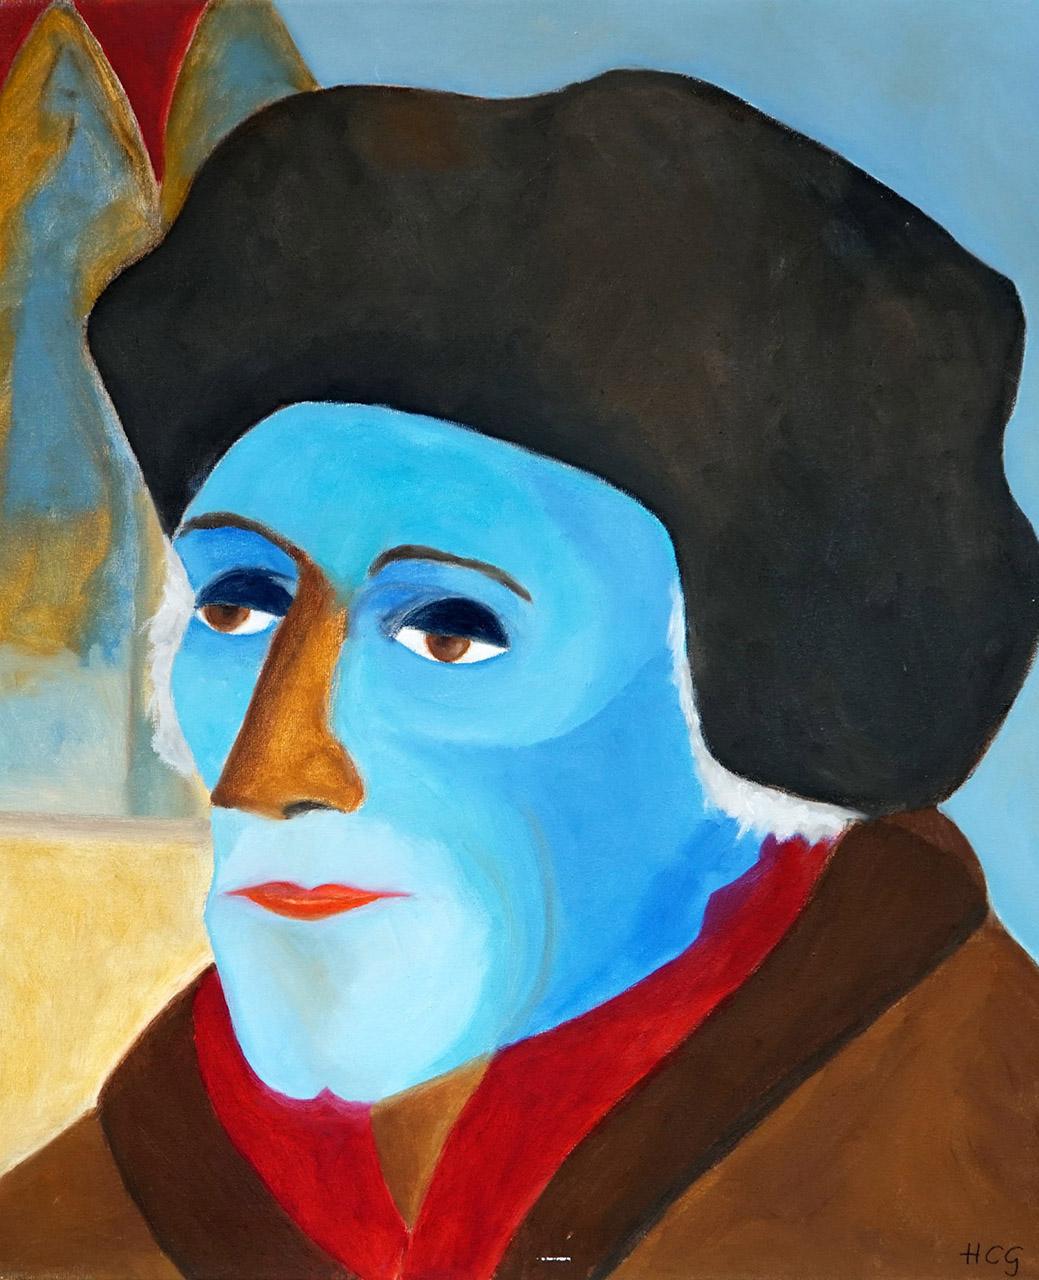 Helma Coumans_Desiderius Erasmus, uit de serie dwarse pegels_Olieverf op doek_50x60